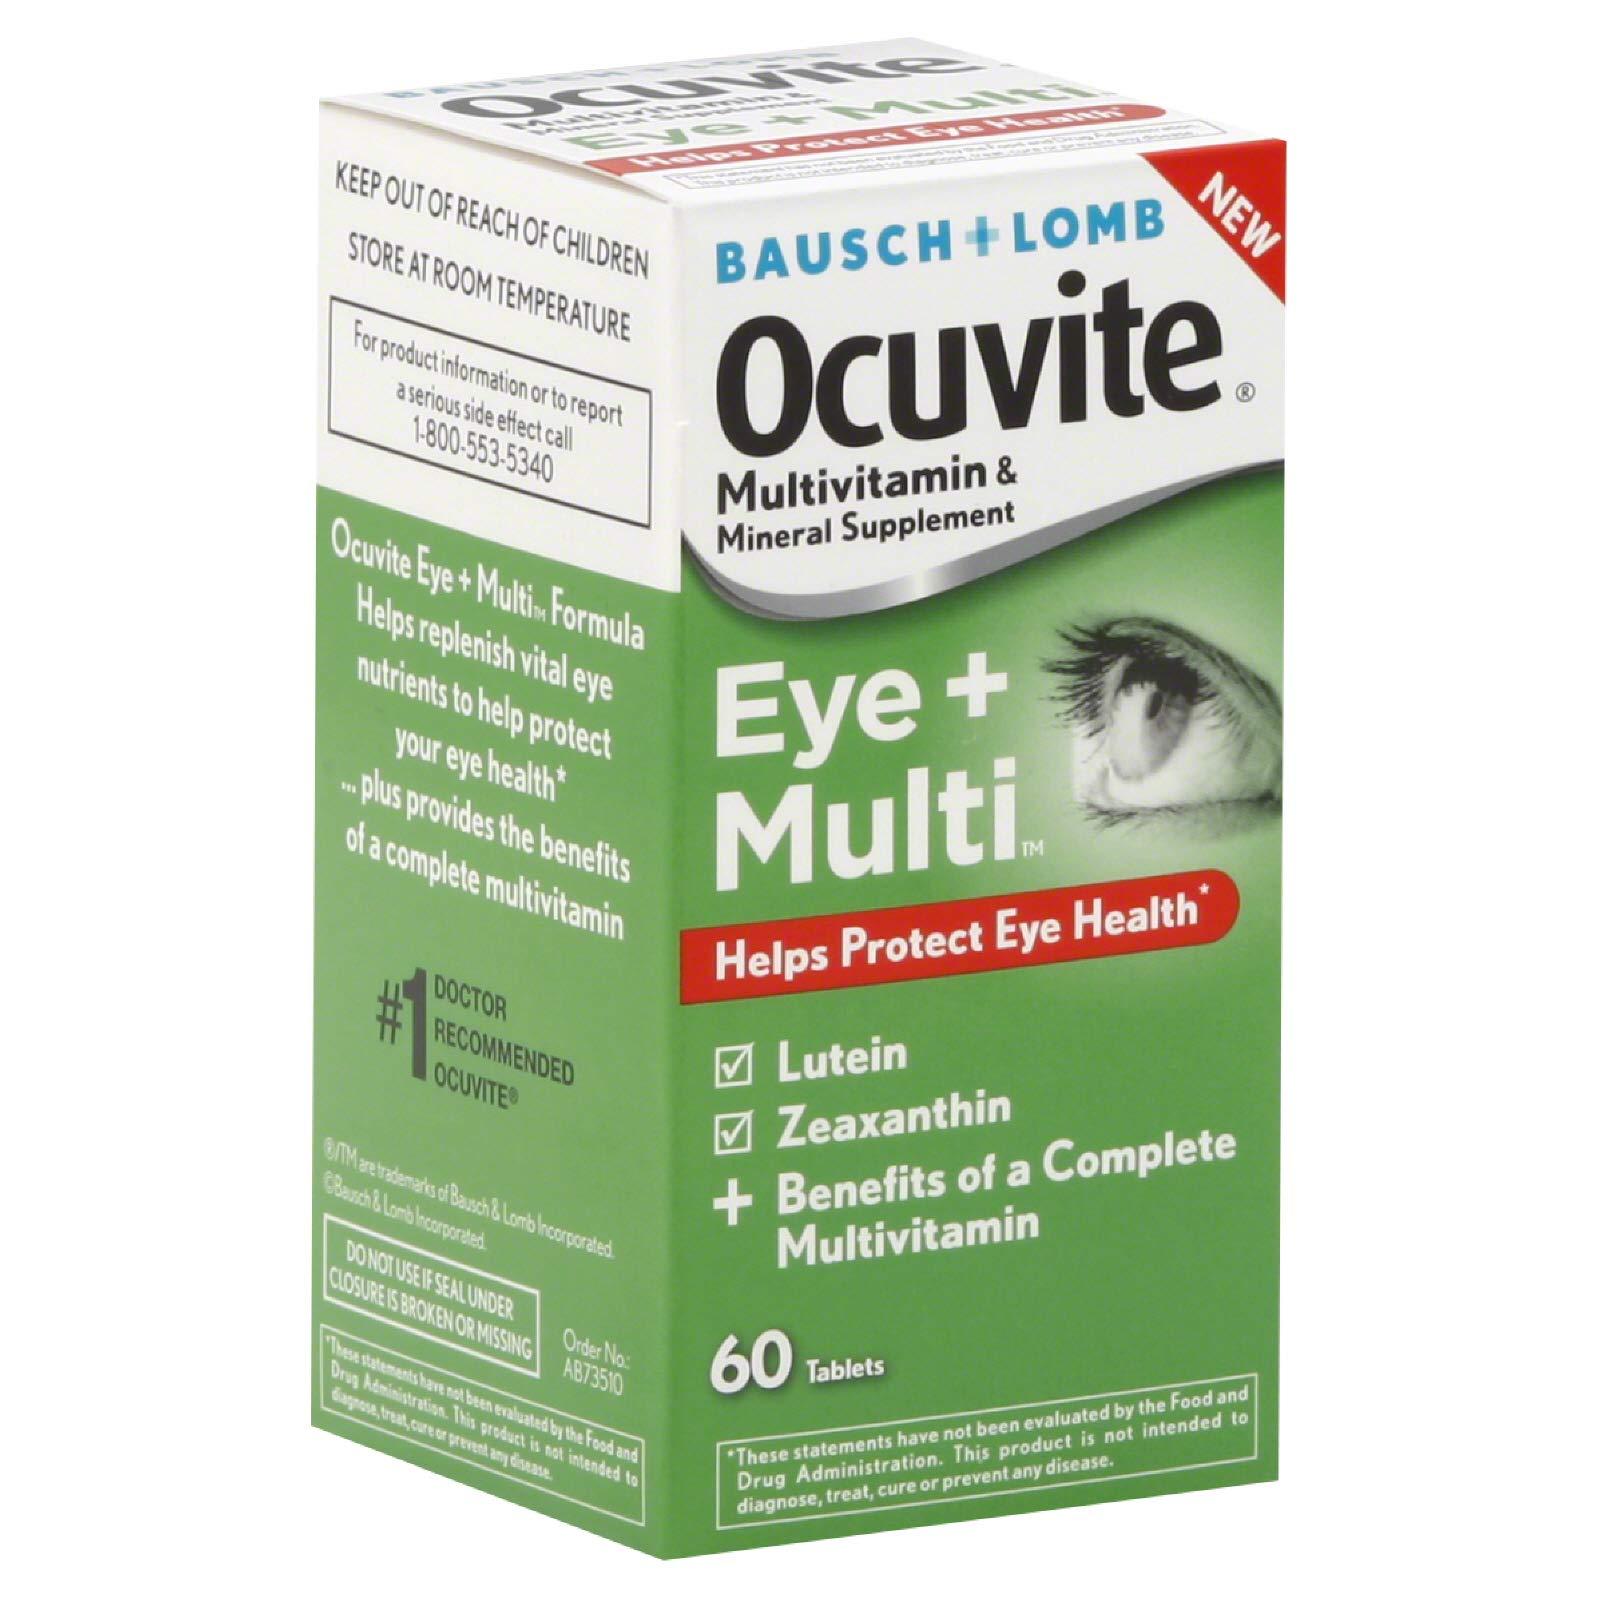 B&L Ocuvite Eye + Multi Size 60ct B&L Ocuvite Eye + Multi 60ct